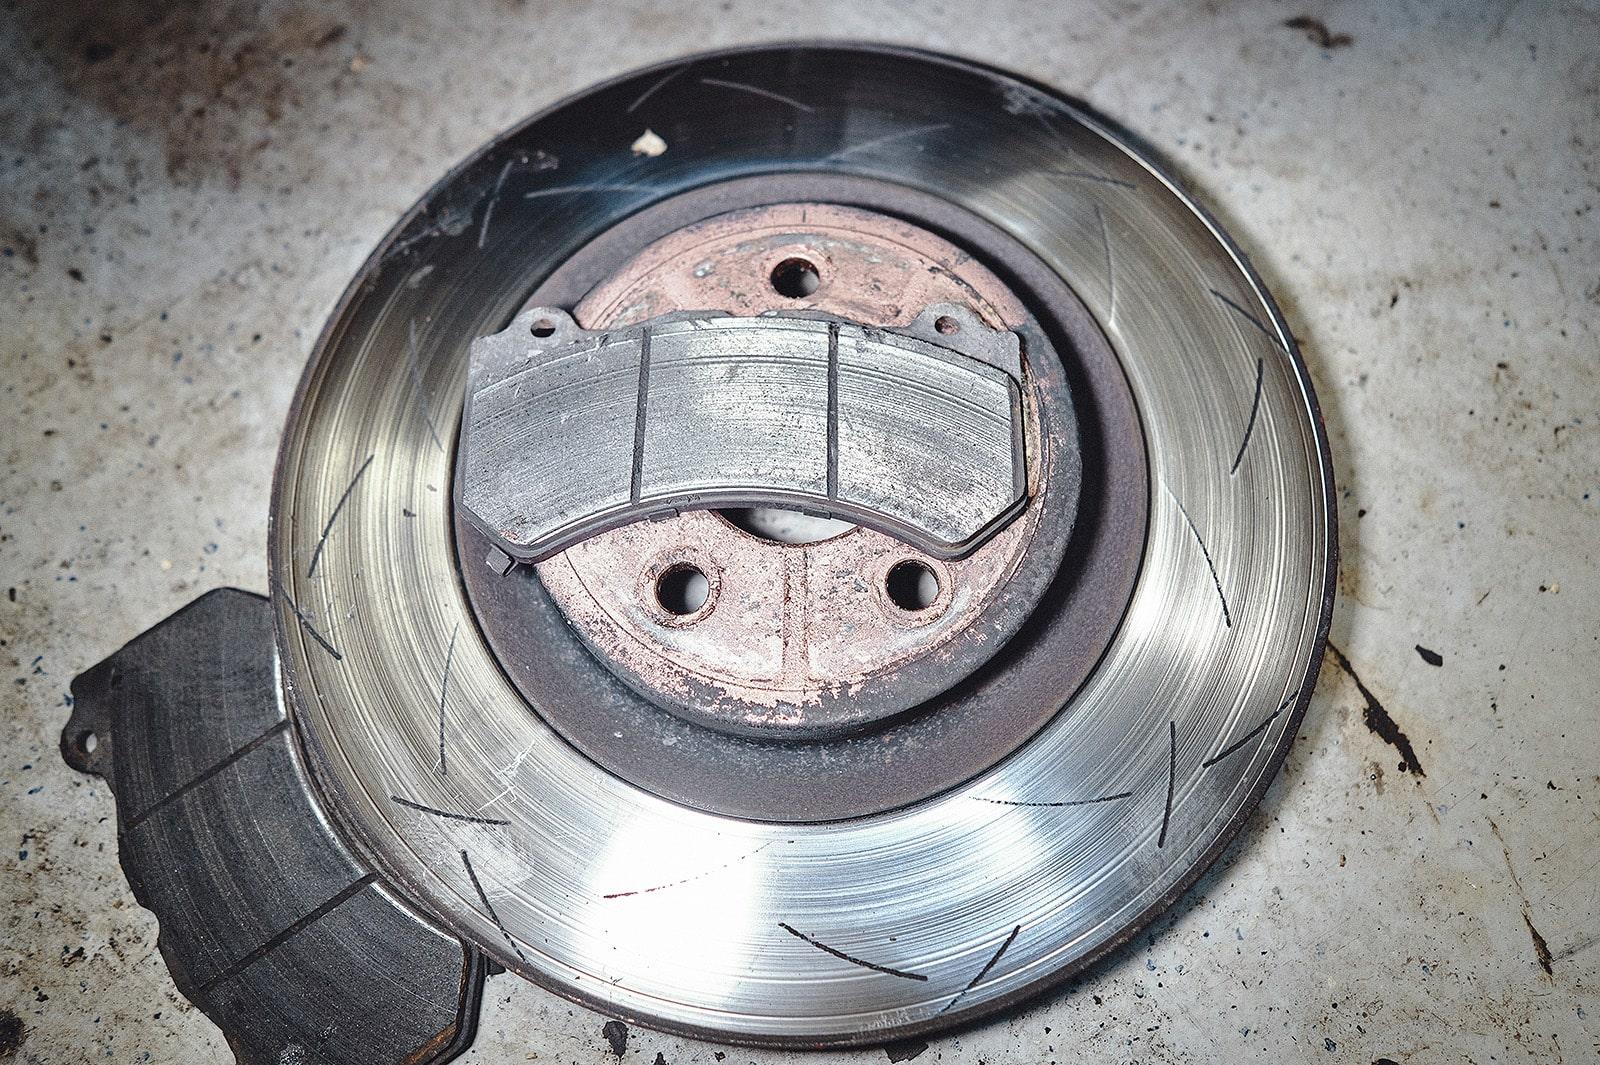 Тормозные диски Гранд Чероки на стадии утилизации